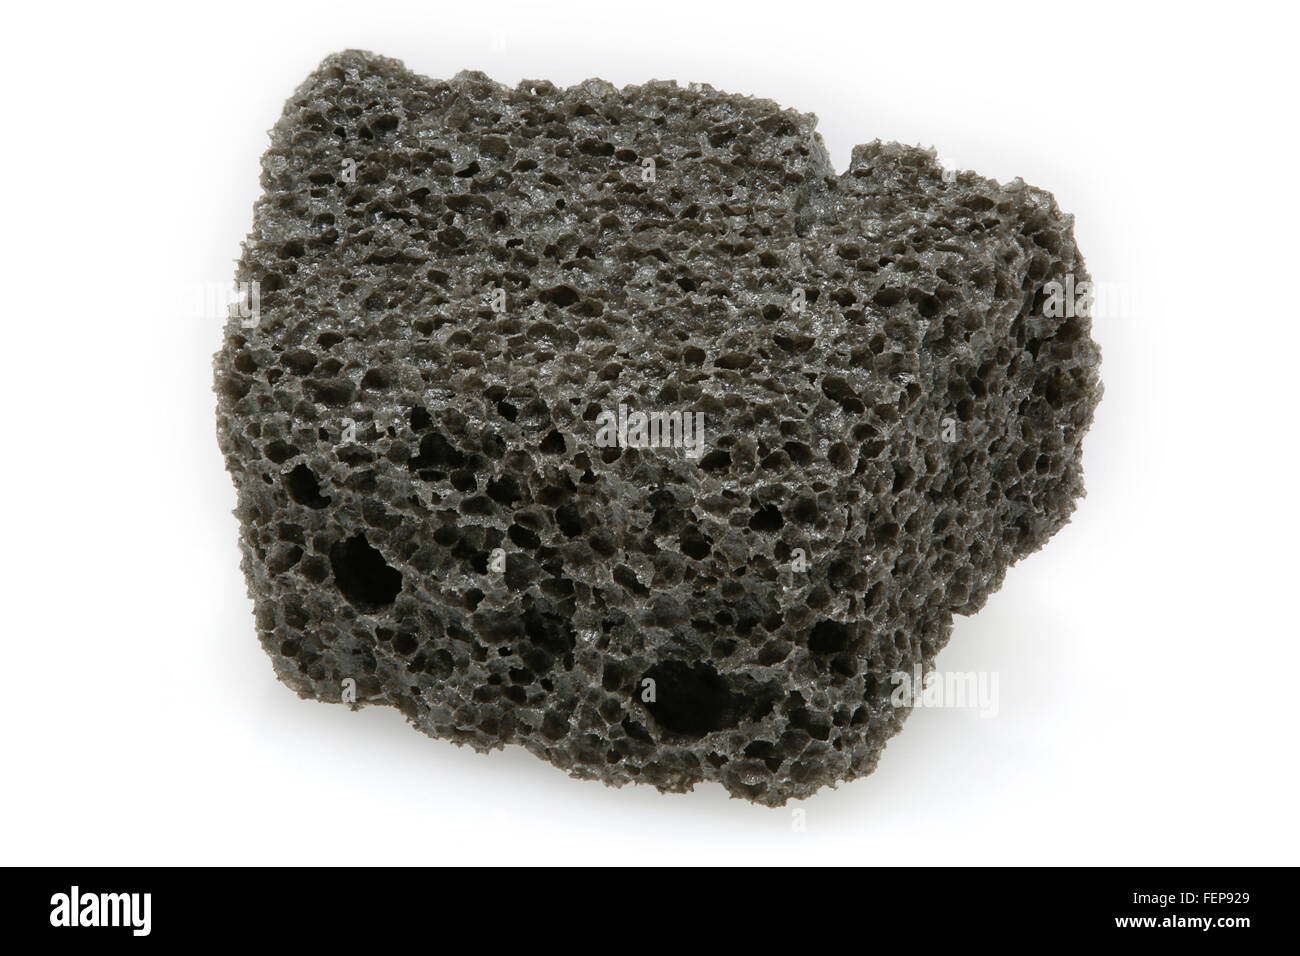 Pumice, Volcanic Igneous Rock, Mexico - Stock Image